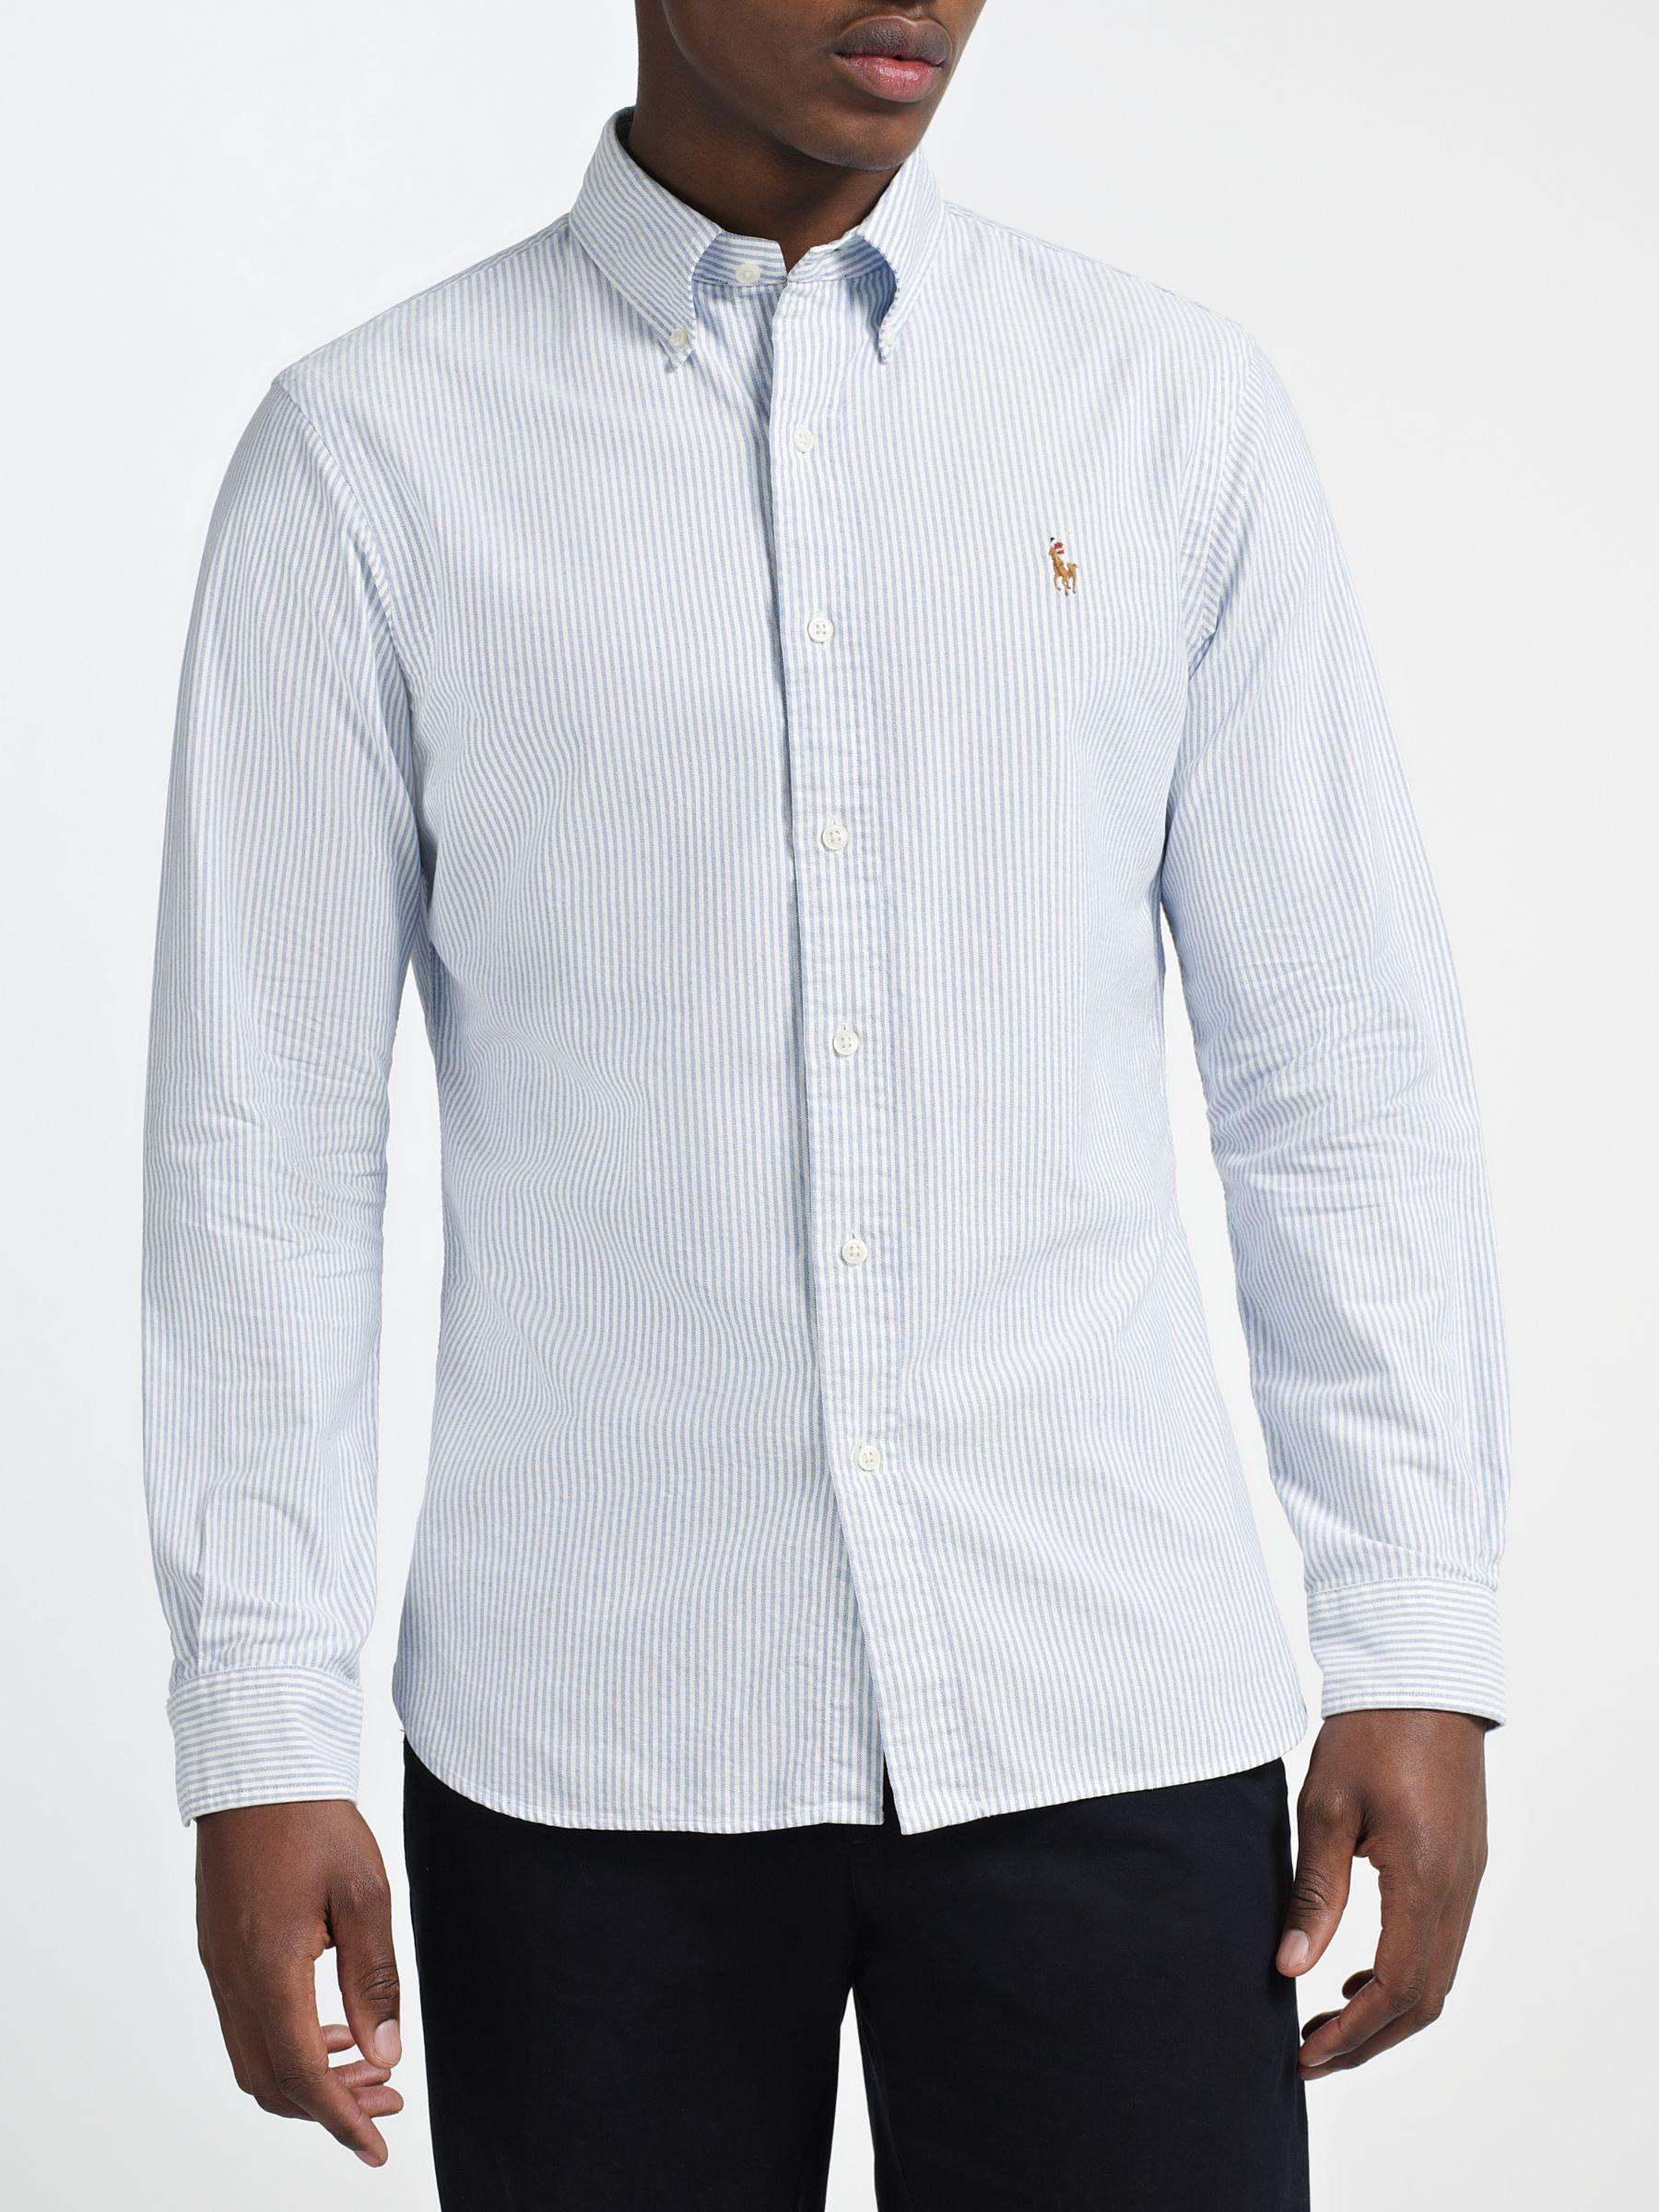 1b2bbb683469 Ralph Lauren Polo Slim Fit Striped Oxford Shirt in Blue for Men - Lyst